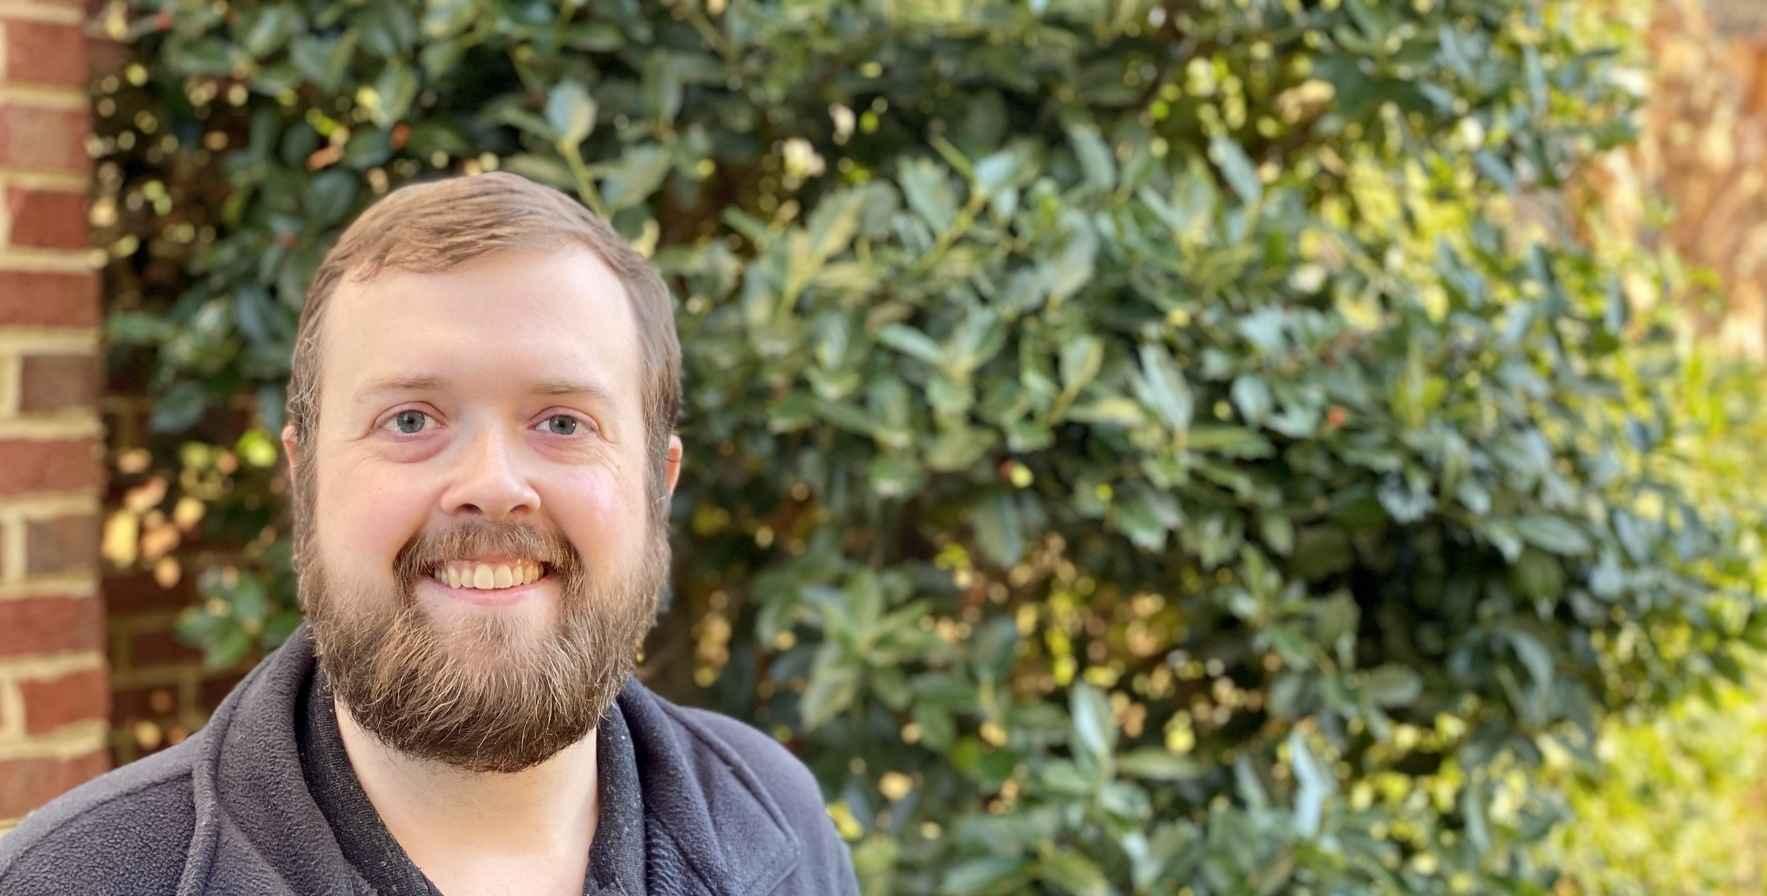 Partner with Paul Sanford image